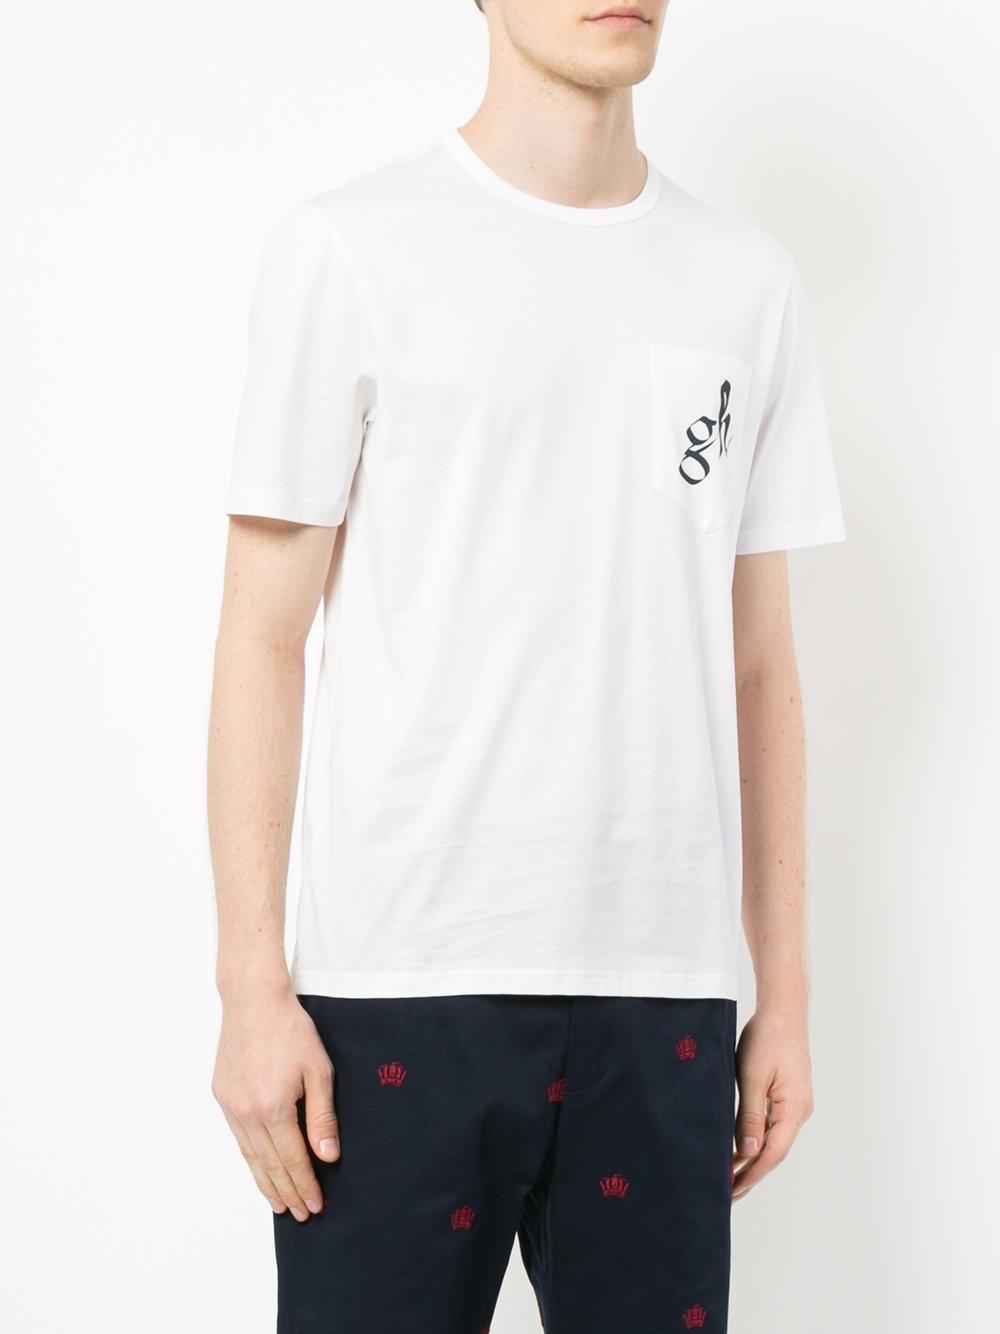 logo print T-shirt - White Gieves & Hawkes Comfortable Sale Online pmJvFj